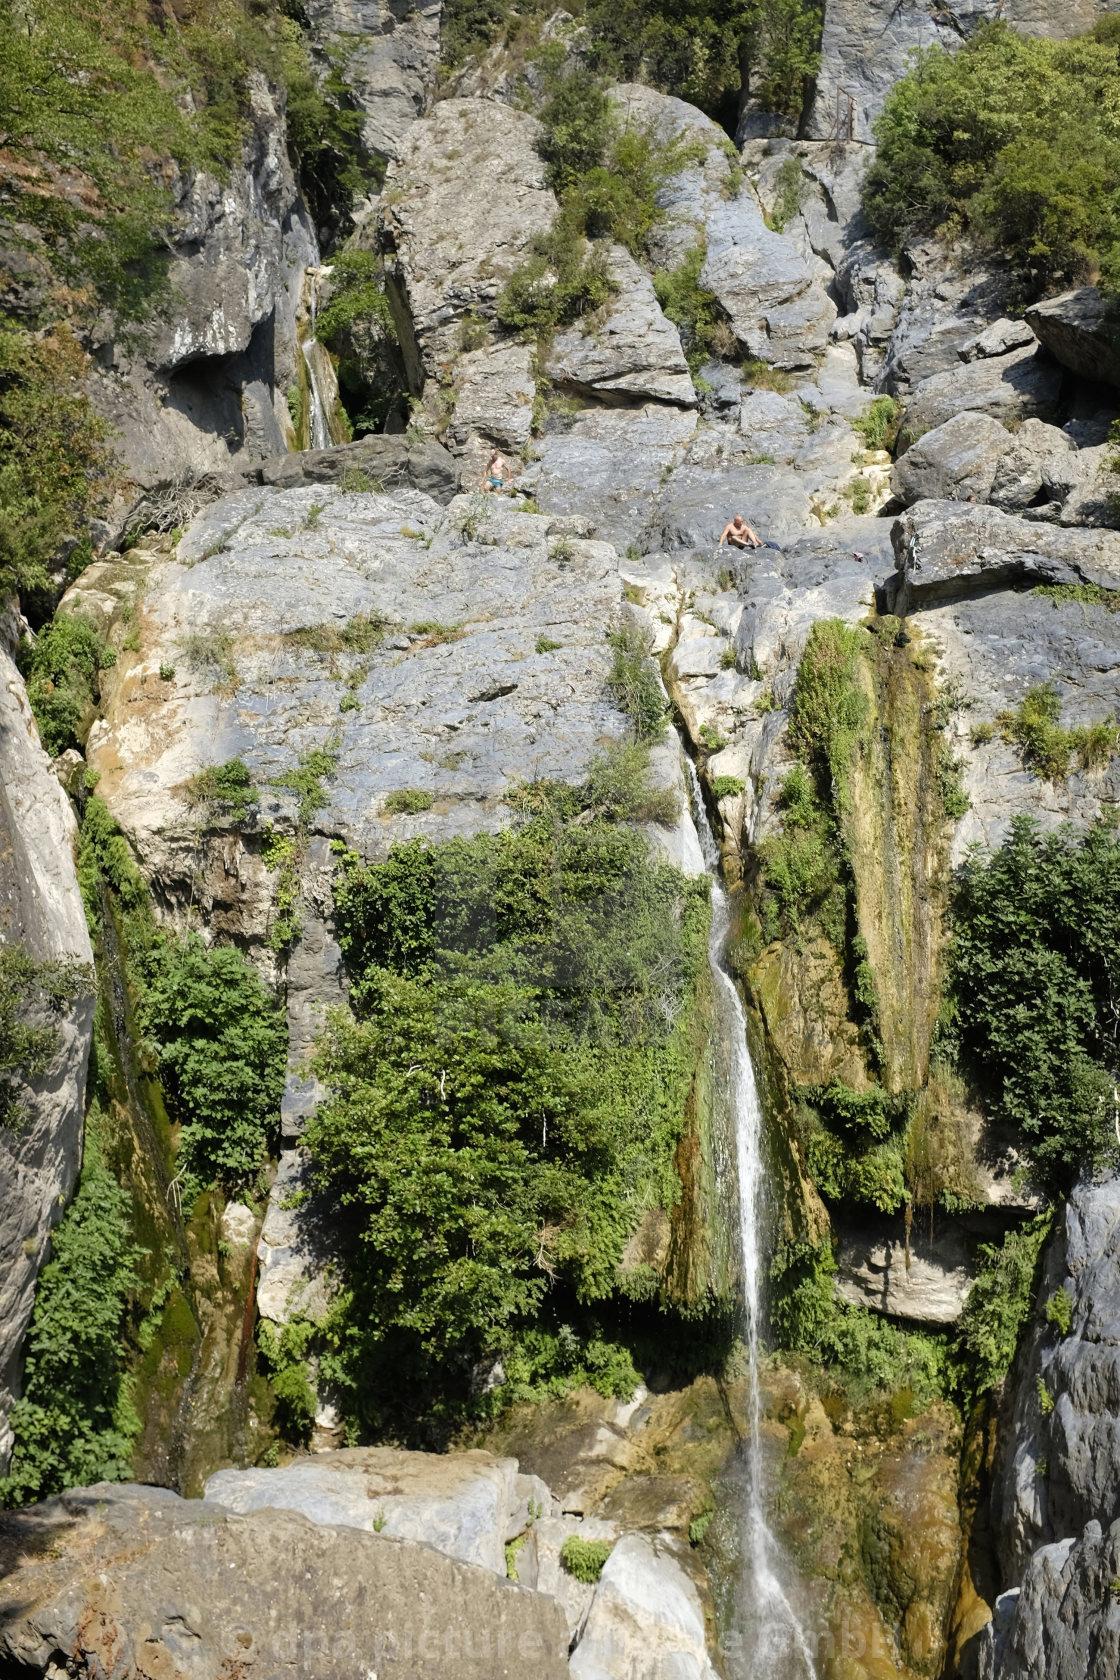 waterfall cascade De L'Ucelluline near San Nicolao on